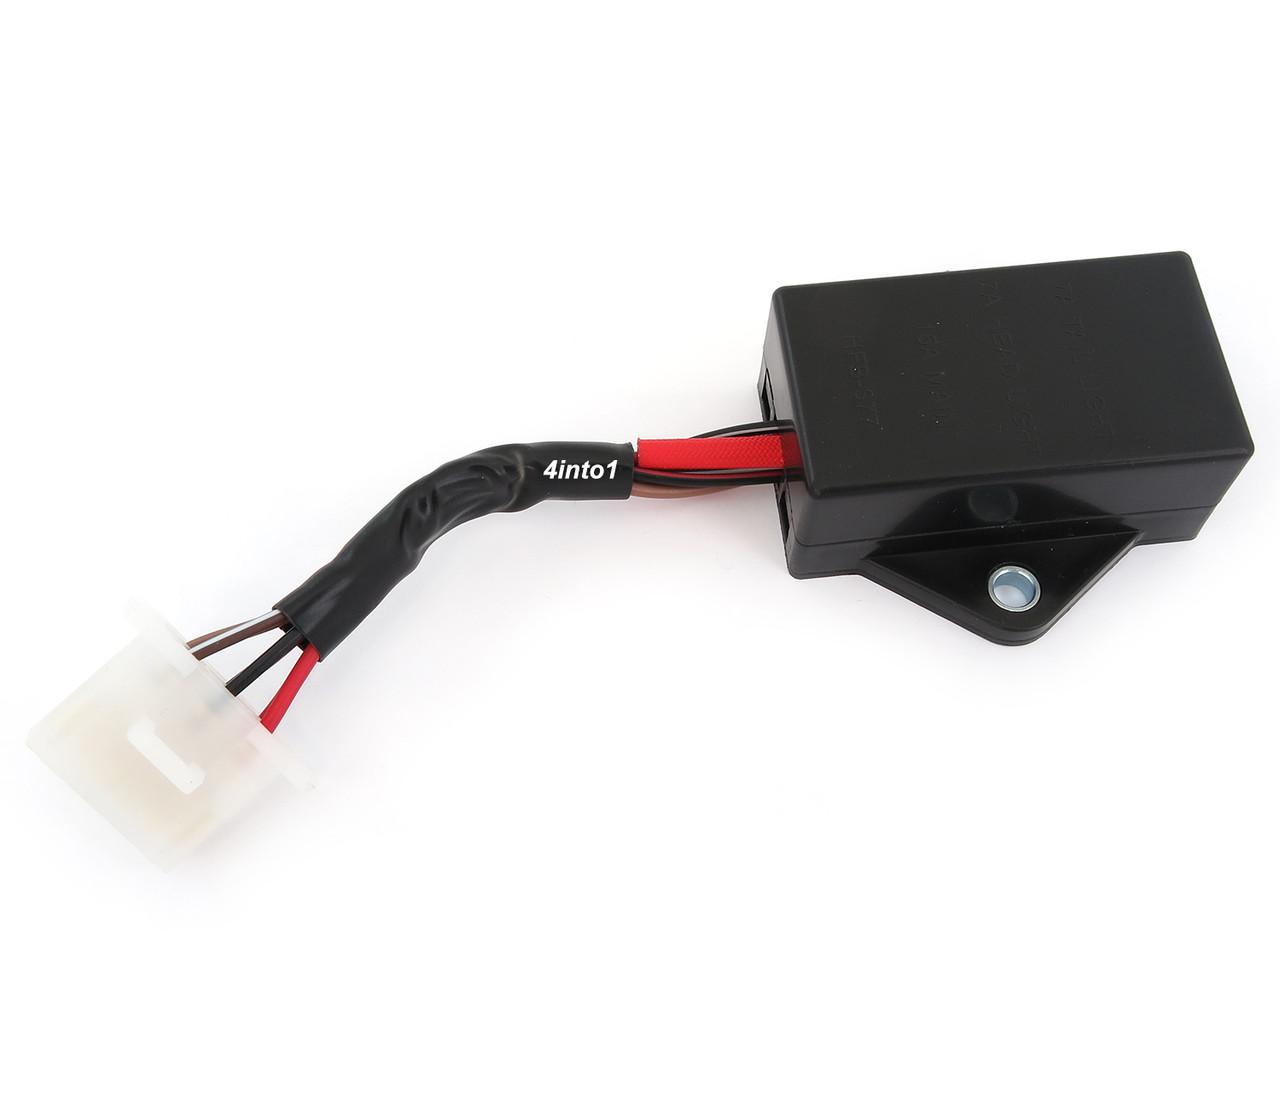 [ZTBE_9966]  Fuse Box Assembly - 38200-377-305 - Honda CB400F/500T/550/750 | Honda Cb 500 Fuse Box |  | 4into1.com